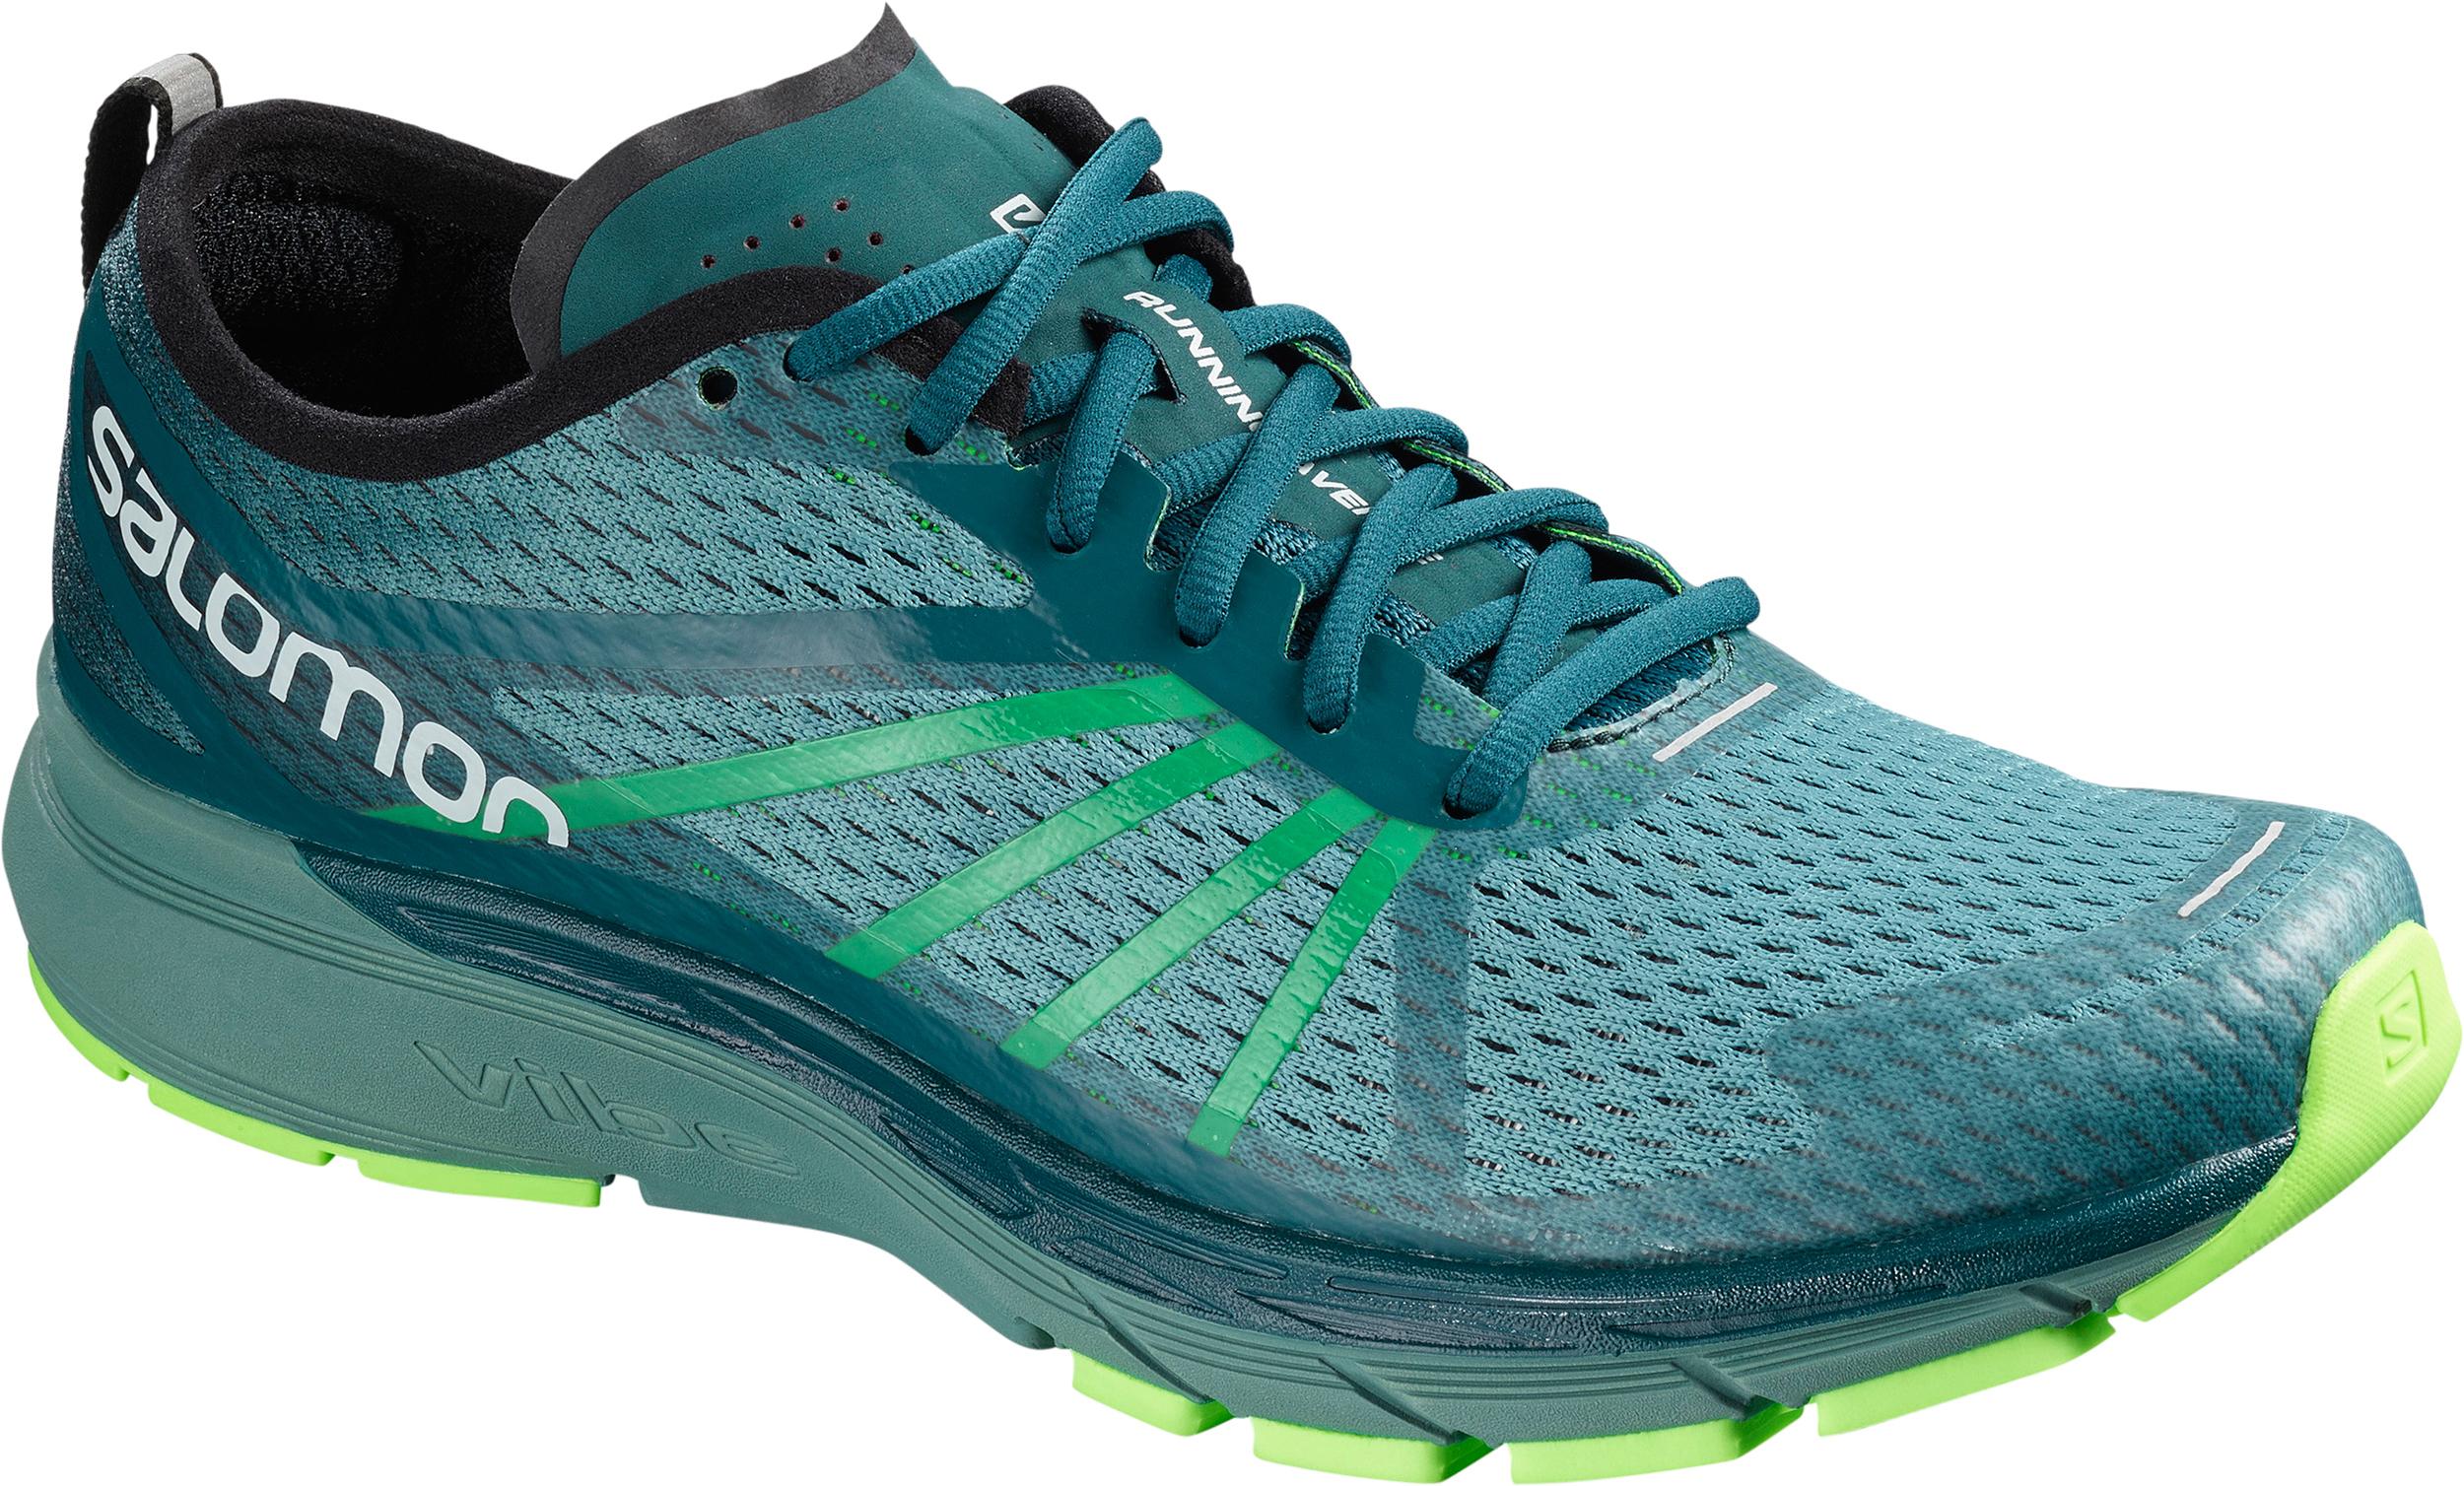 6b7715149597 Salomon Sonic RA Pro Road Running Shoes - Men s